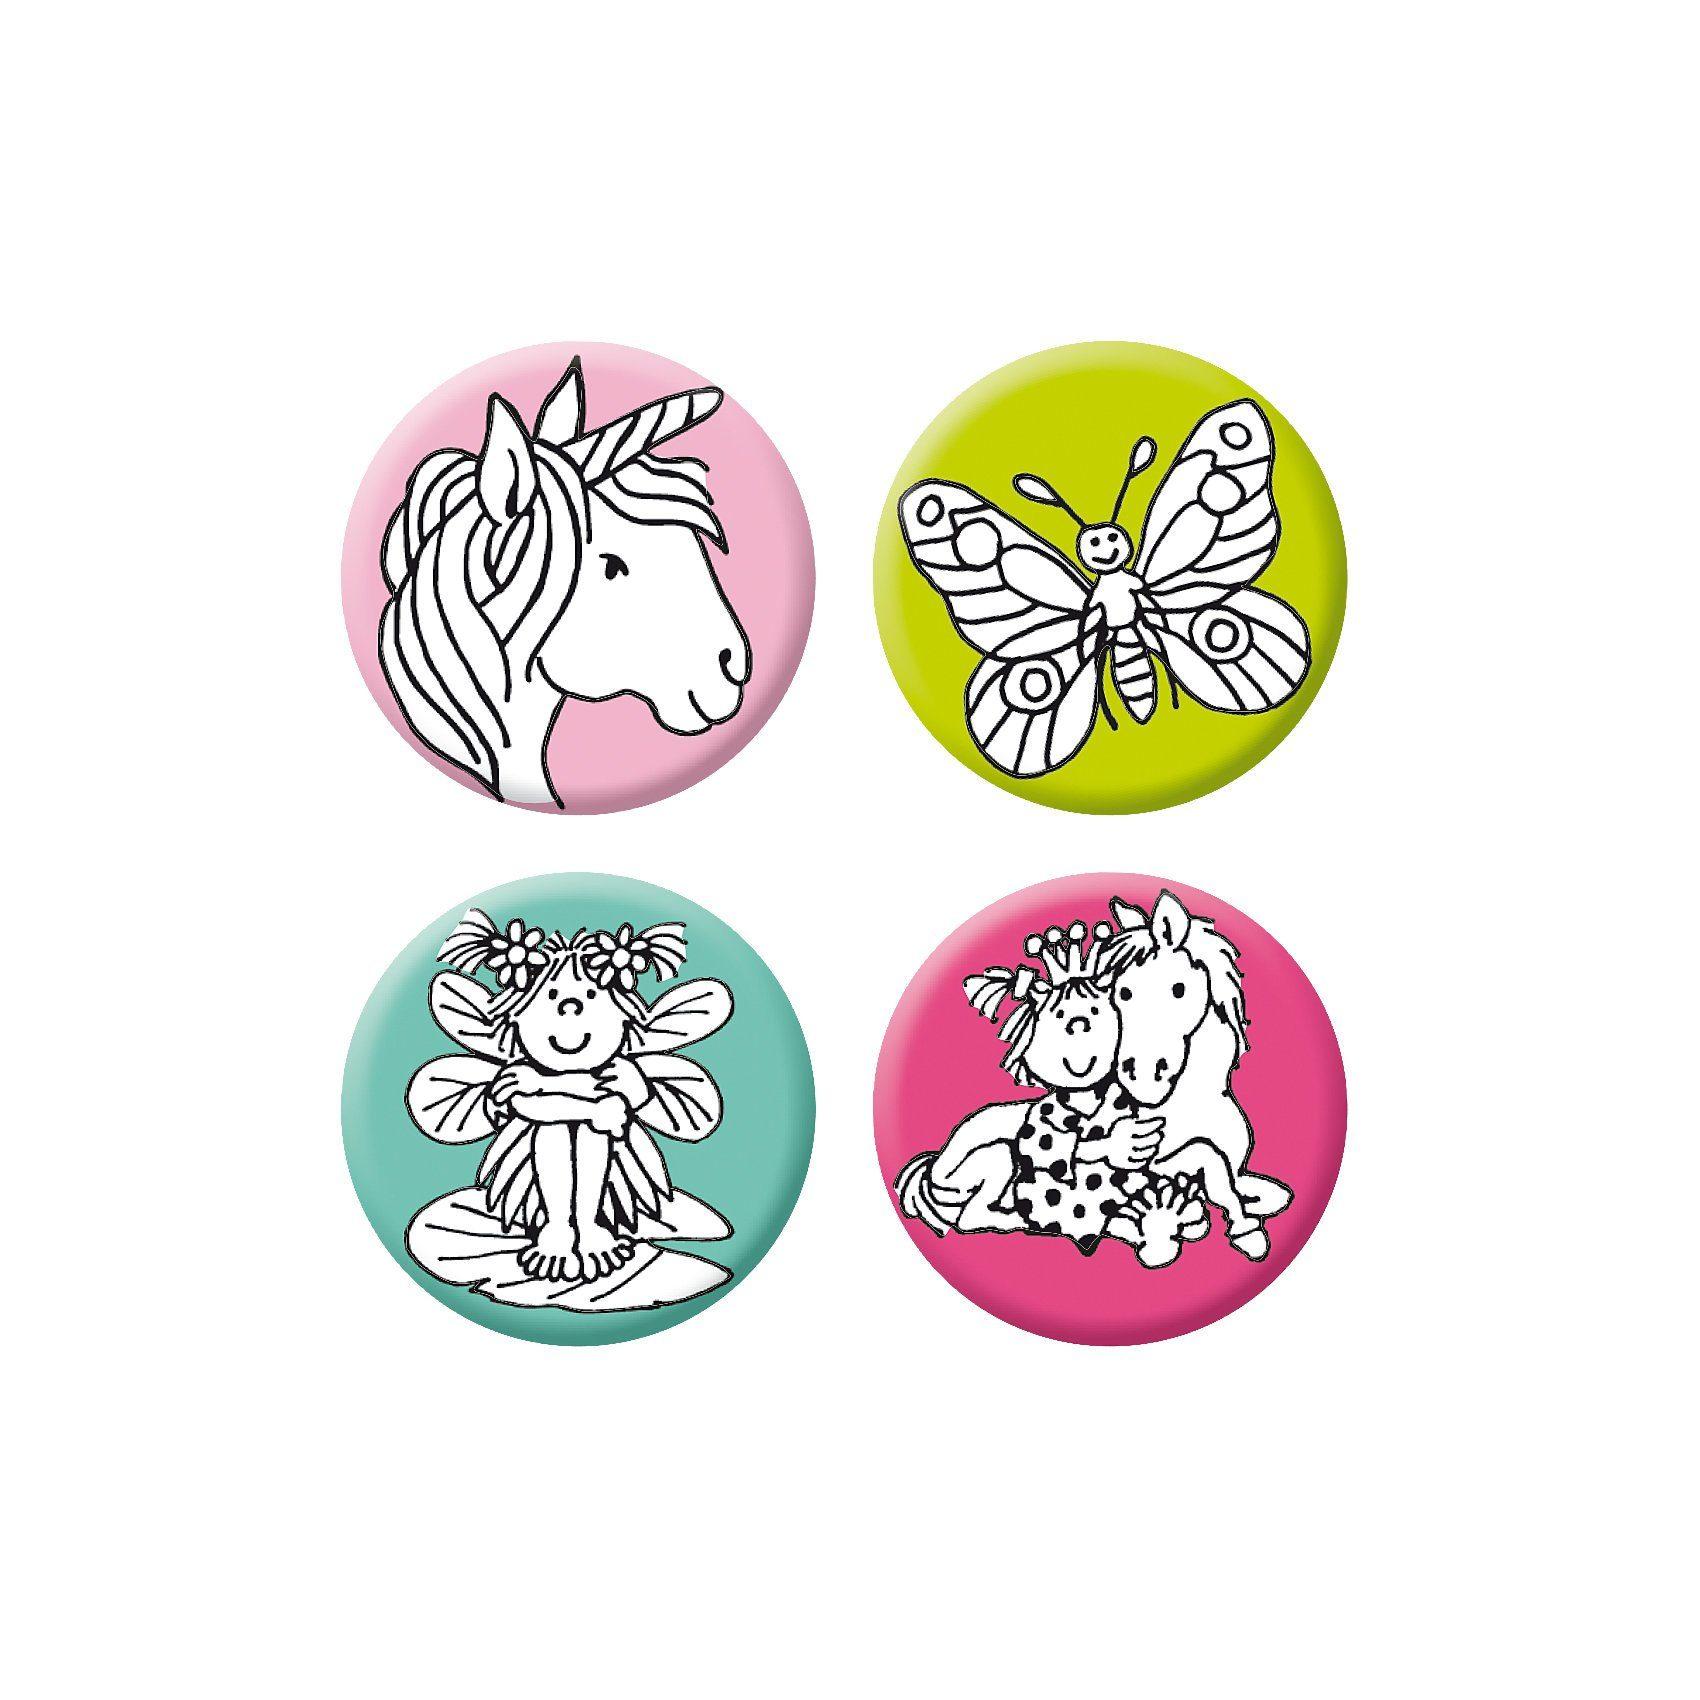 Lutz Mauder Verlag Mini-Reflektor-Button-Set Mädchen 2, 4-tlg.